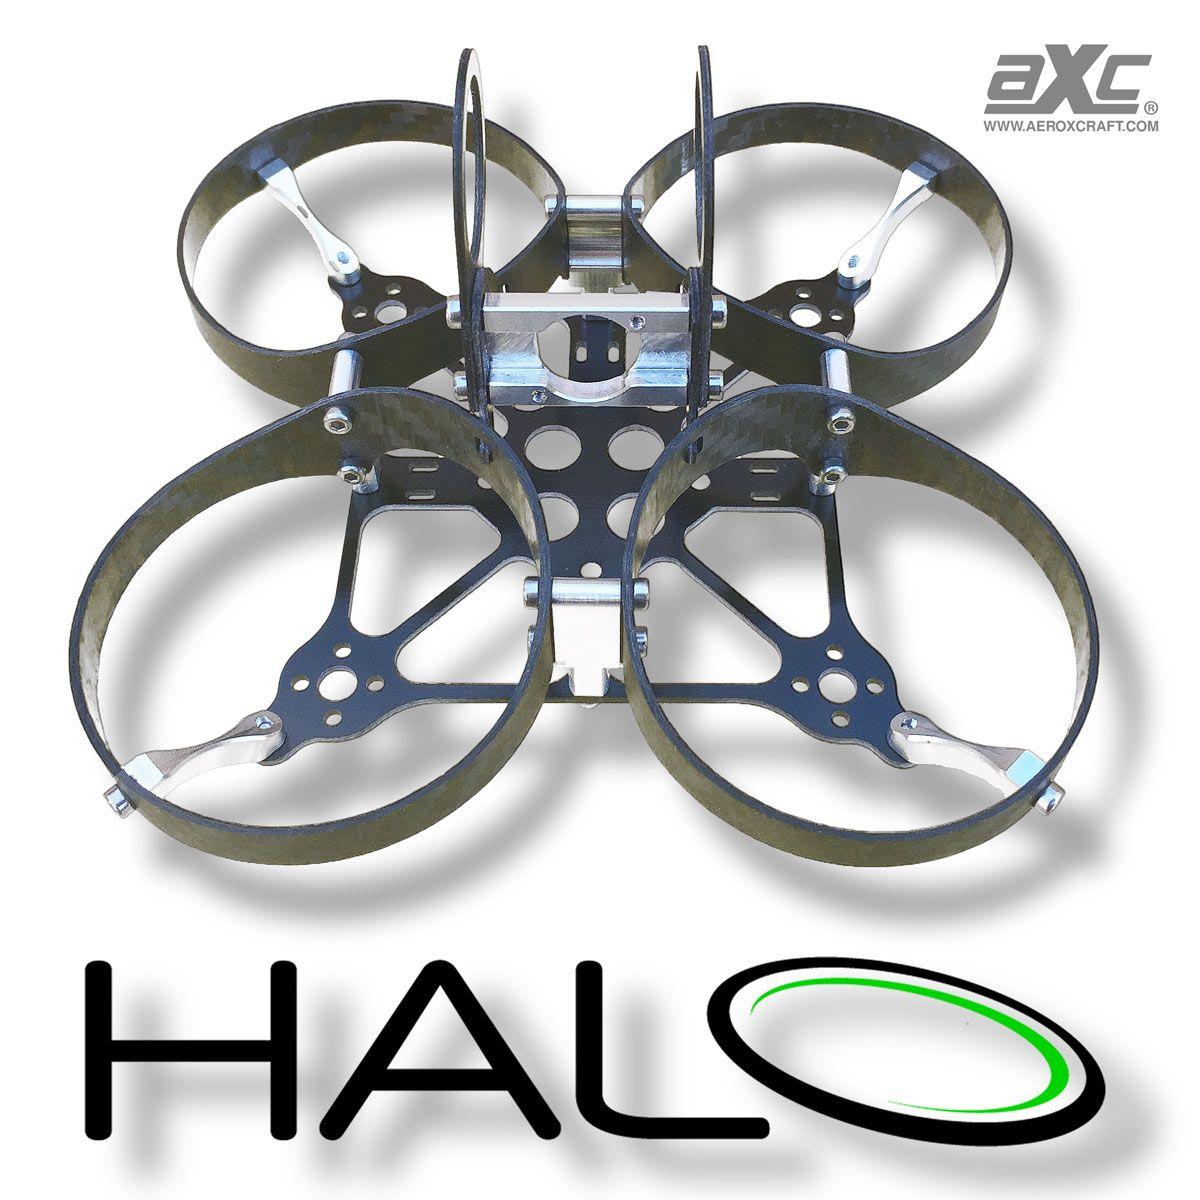 Aeroxcraft AXC Halo Micro FPV Carbon Fiber Ducted Quad Frame